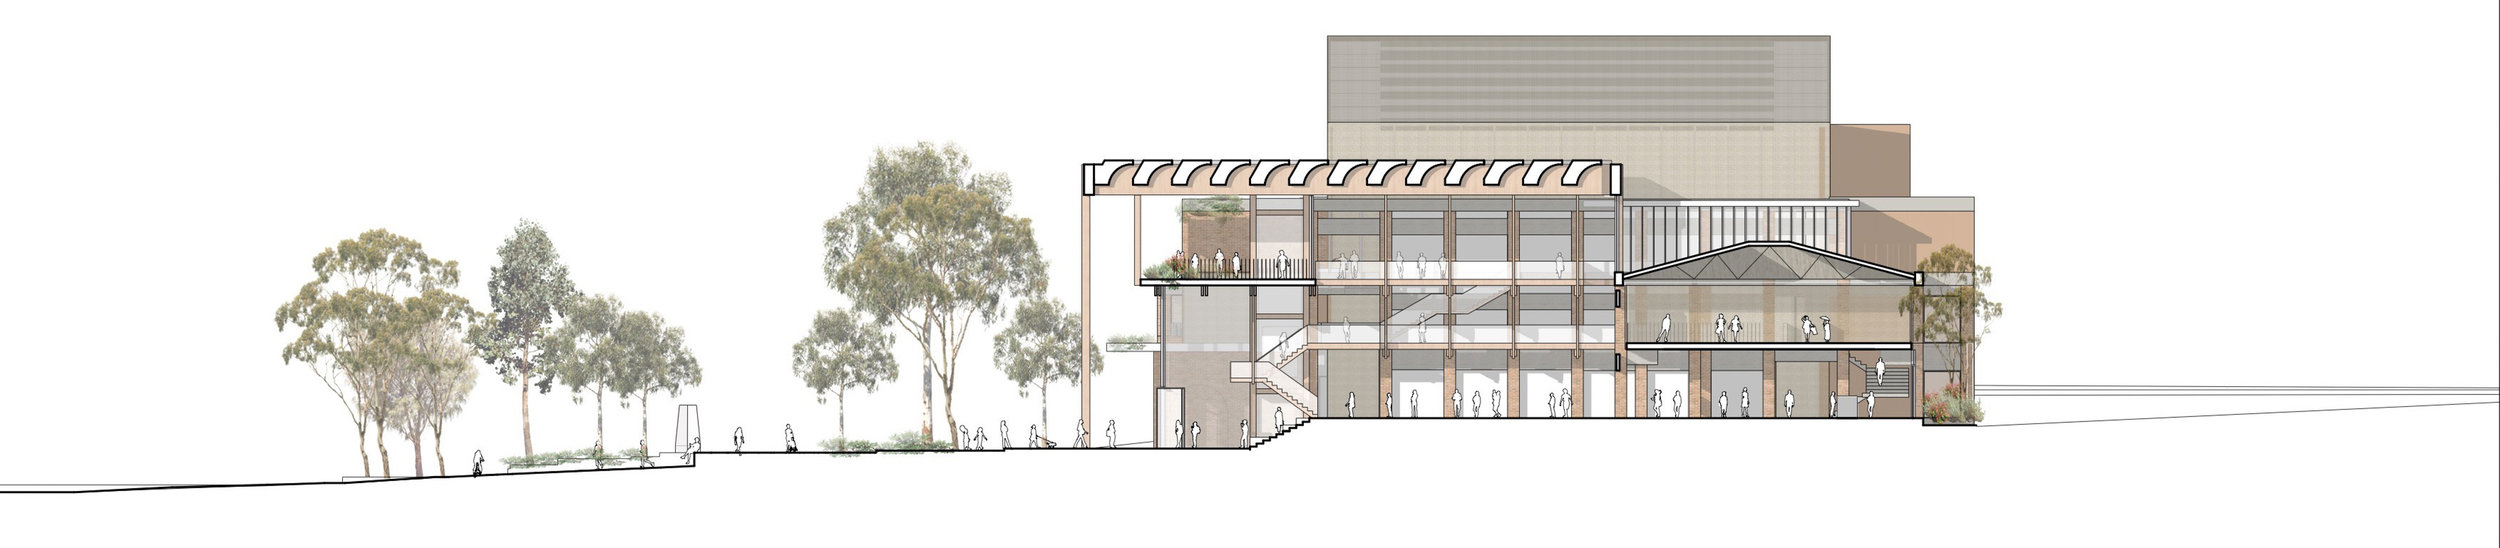 sutherland-entertainment-centre-chrofi-nbrs-architecture-the-design-emotive-05.jpg